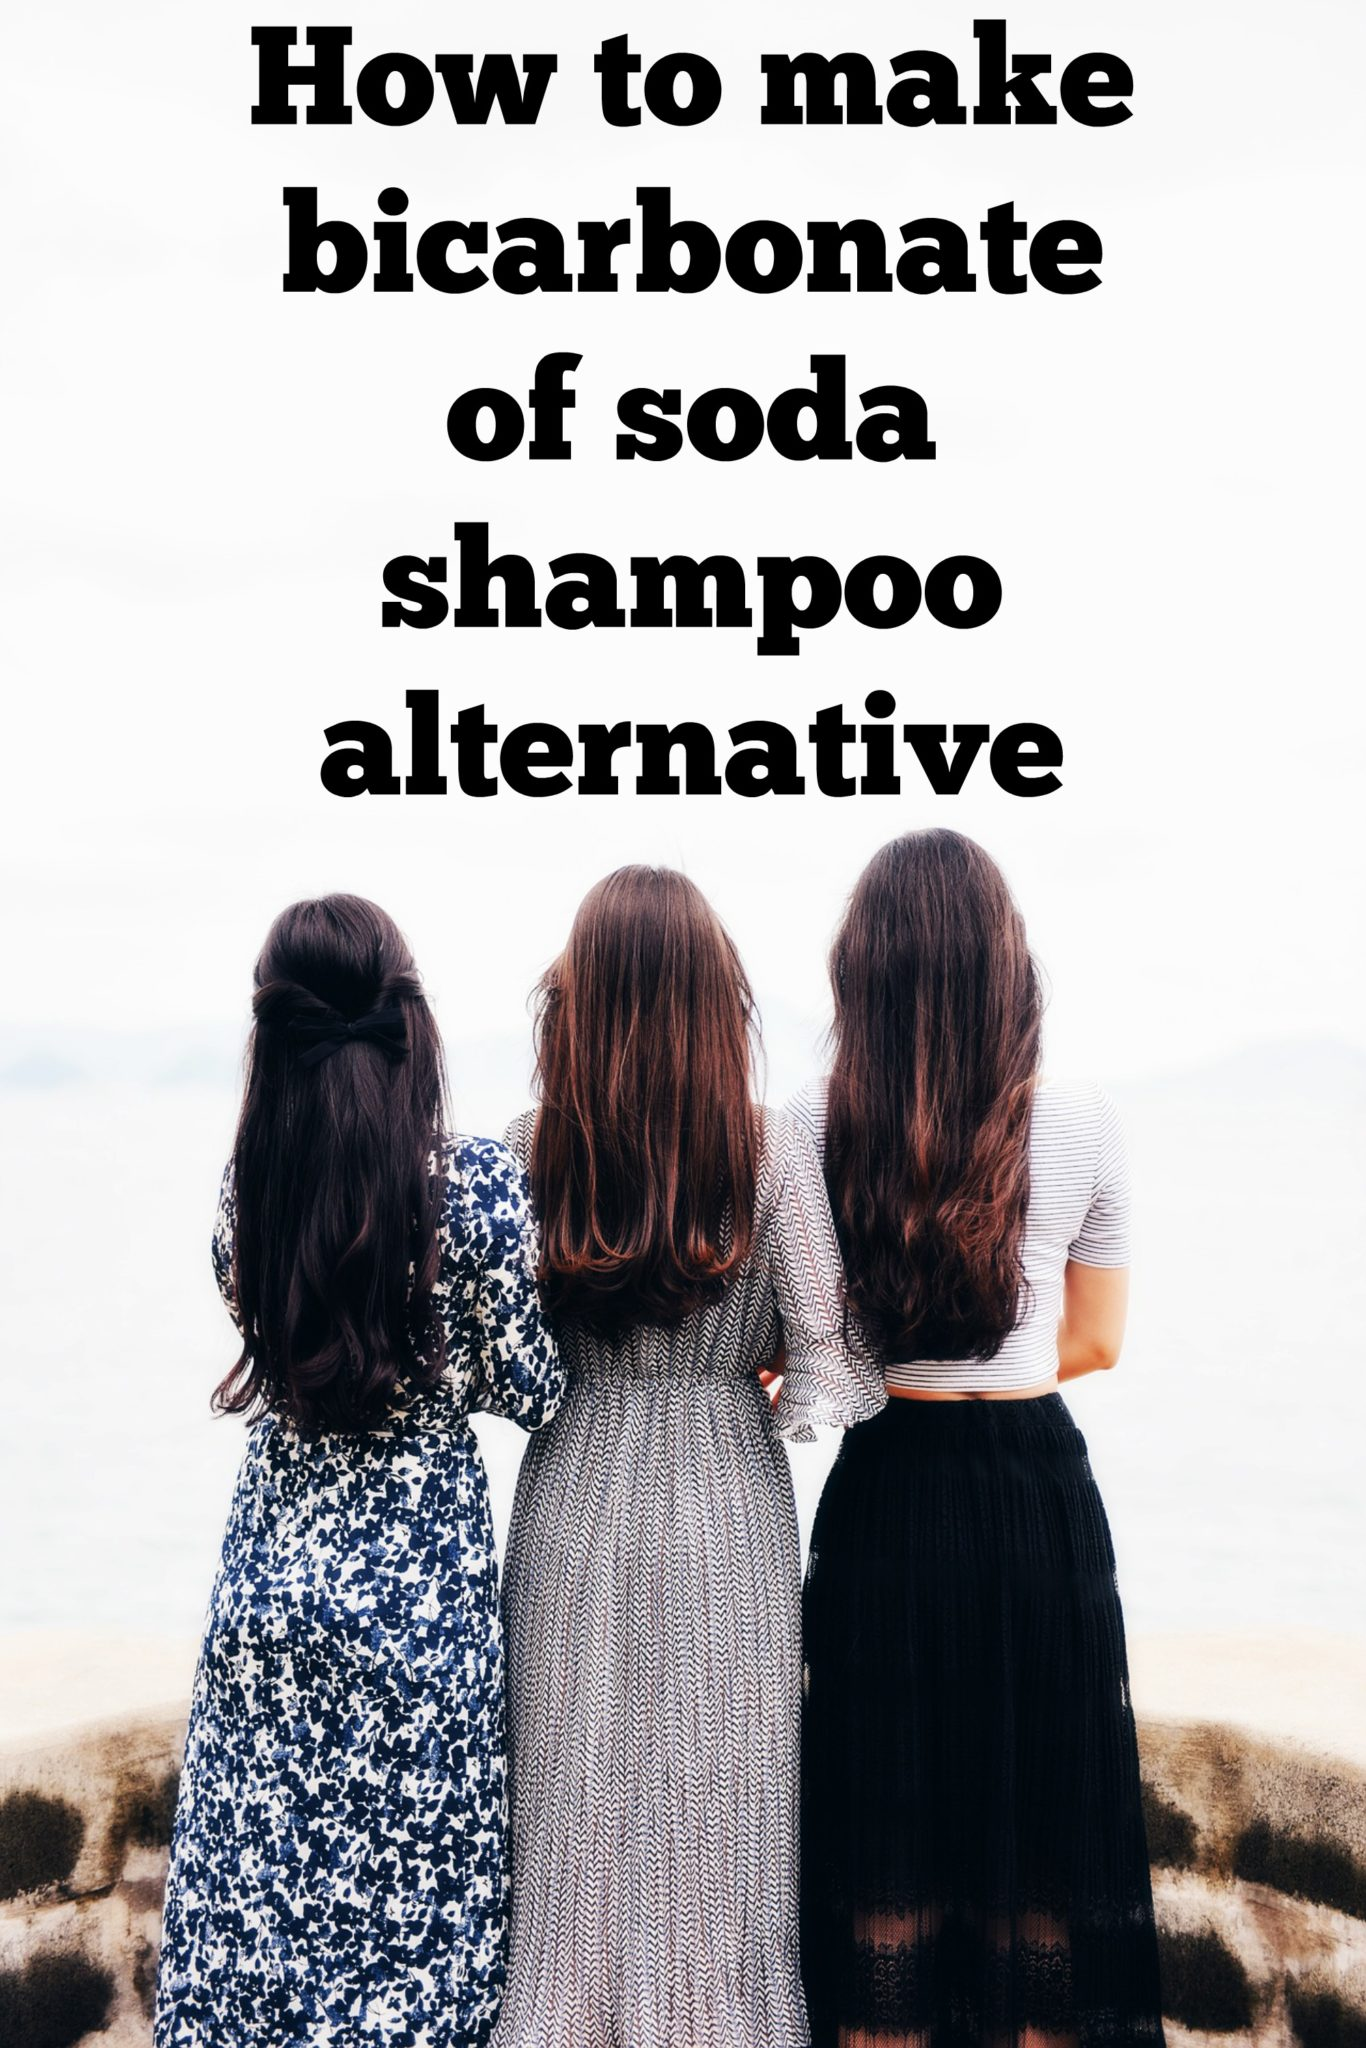 bicarbonate of soda shampoo alternative